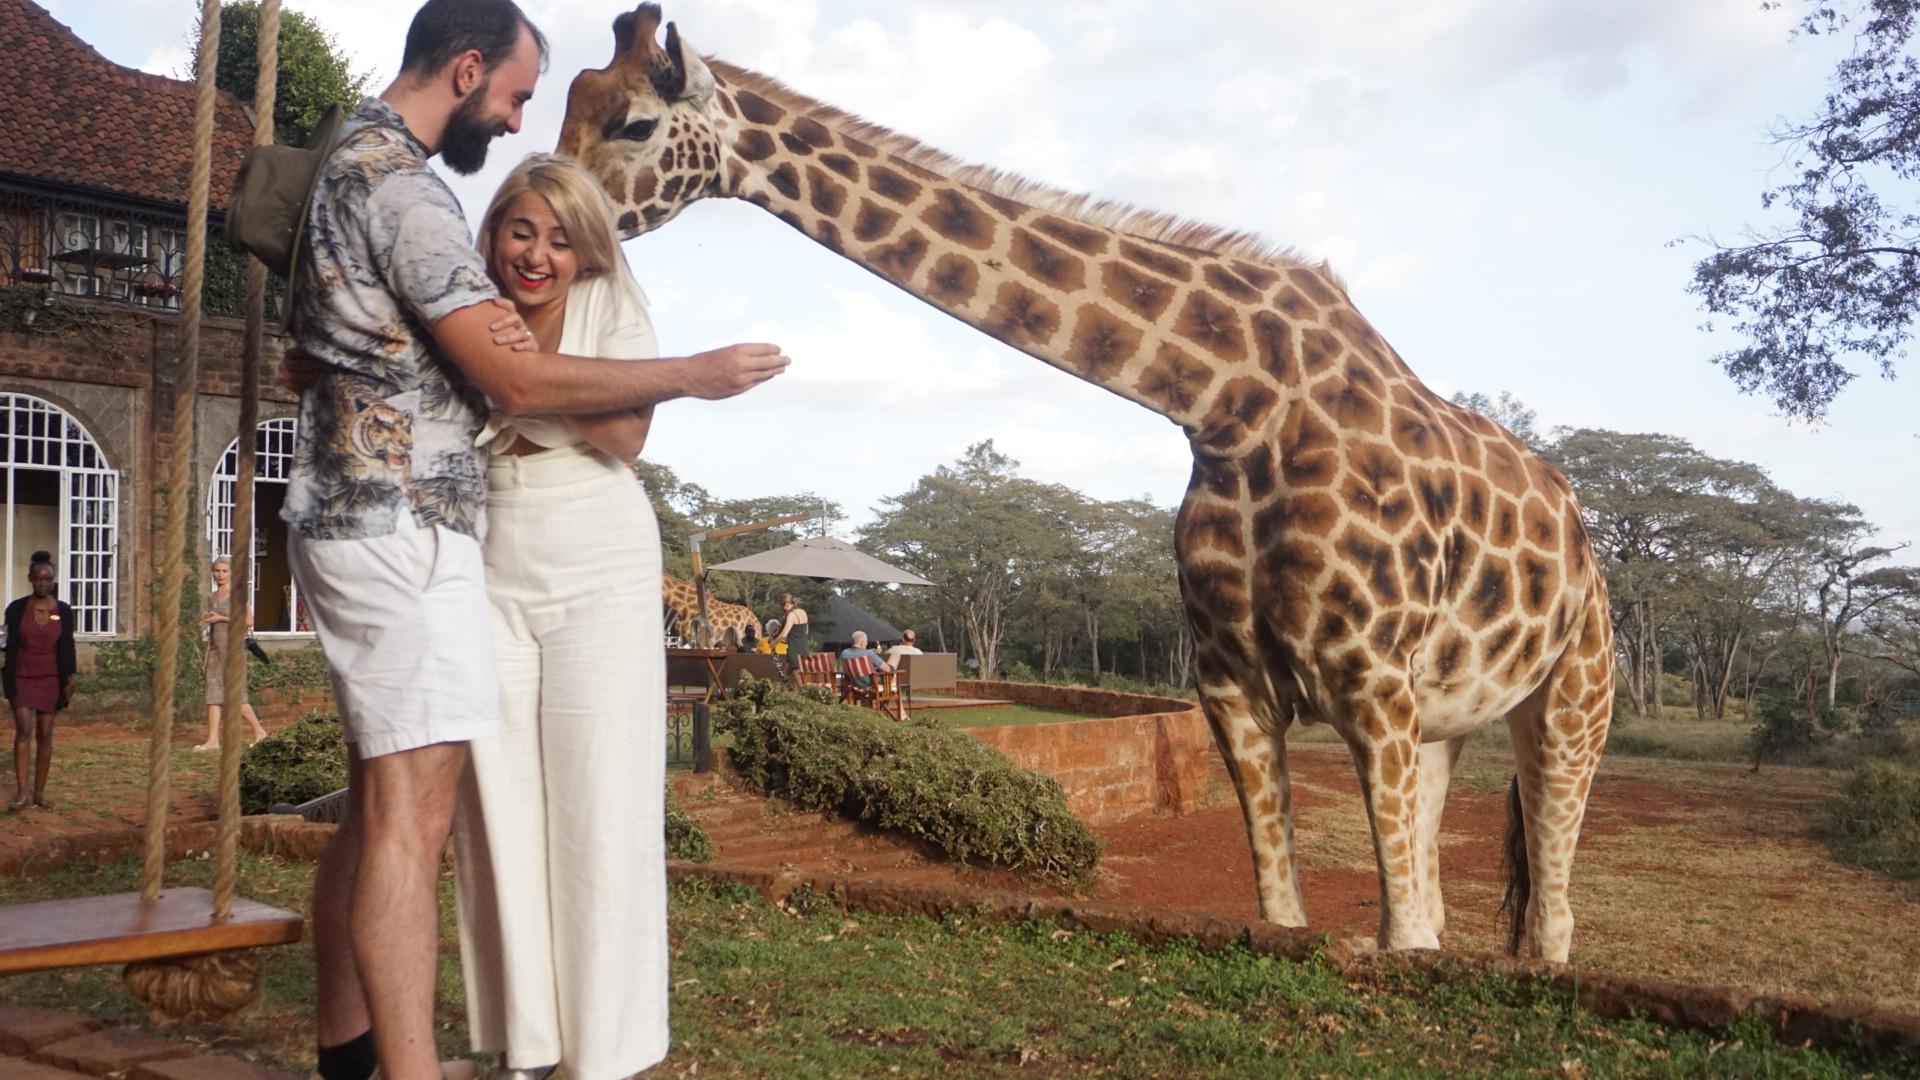 me-and-zeena-giraffe-manor-pic